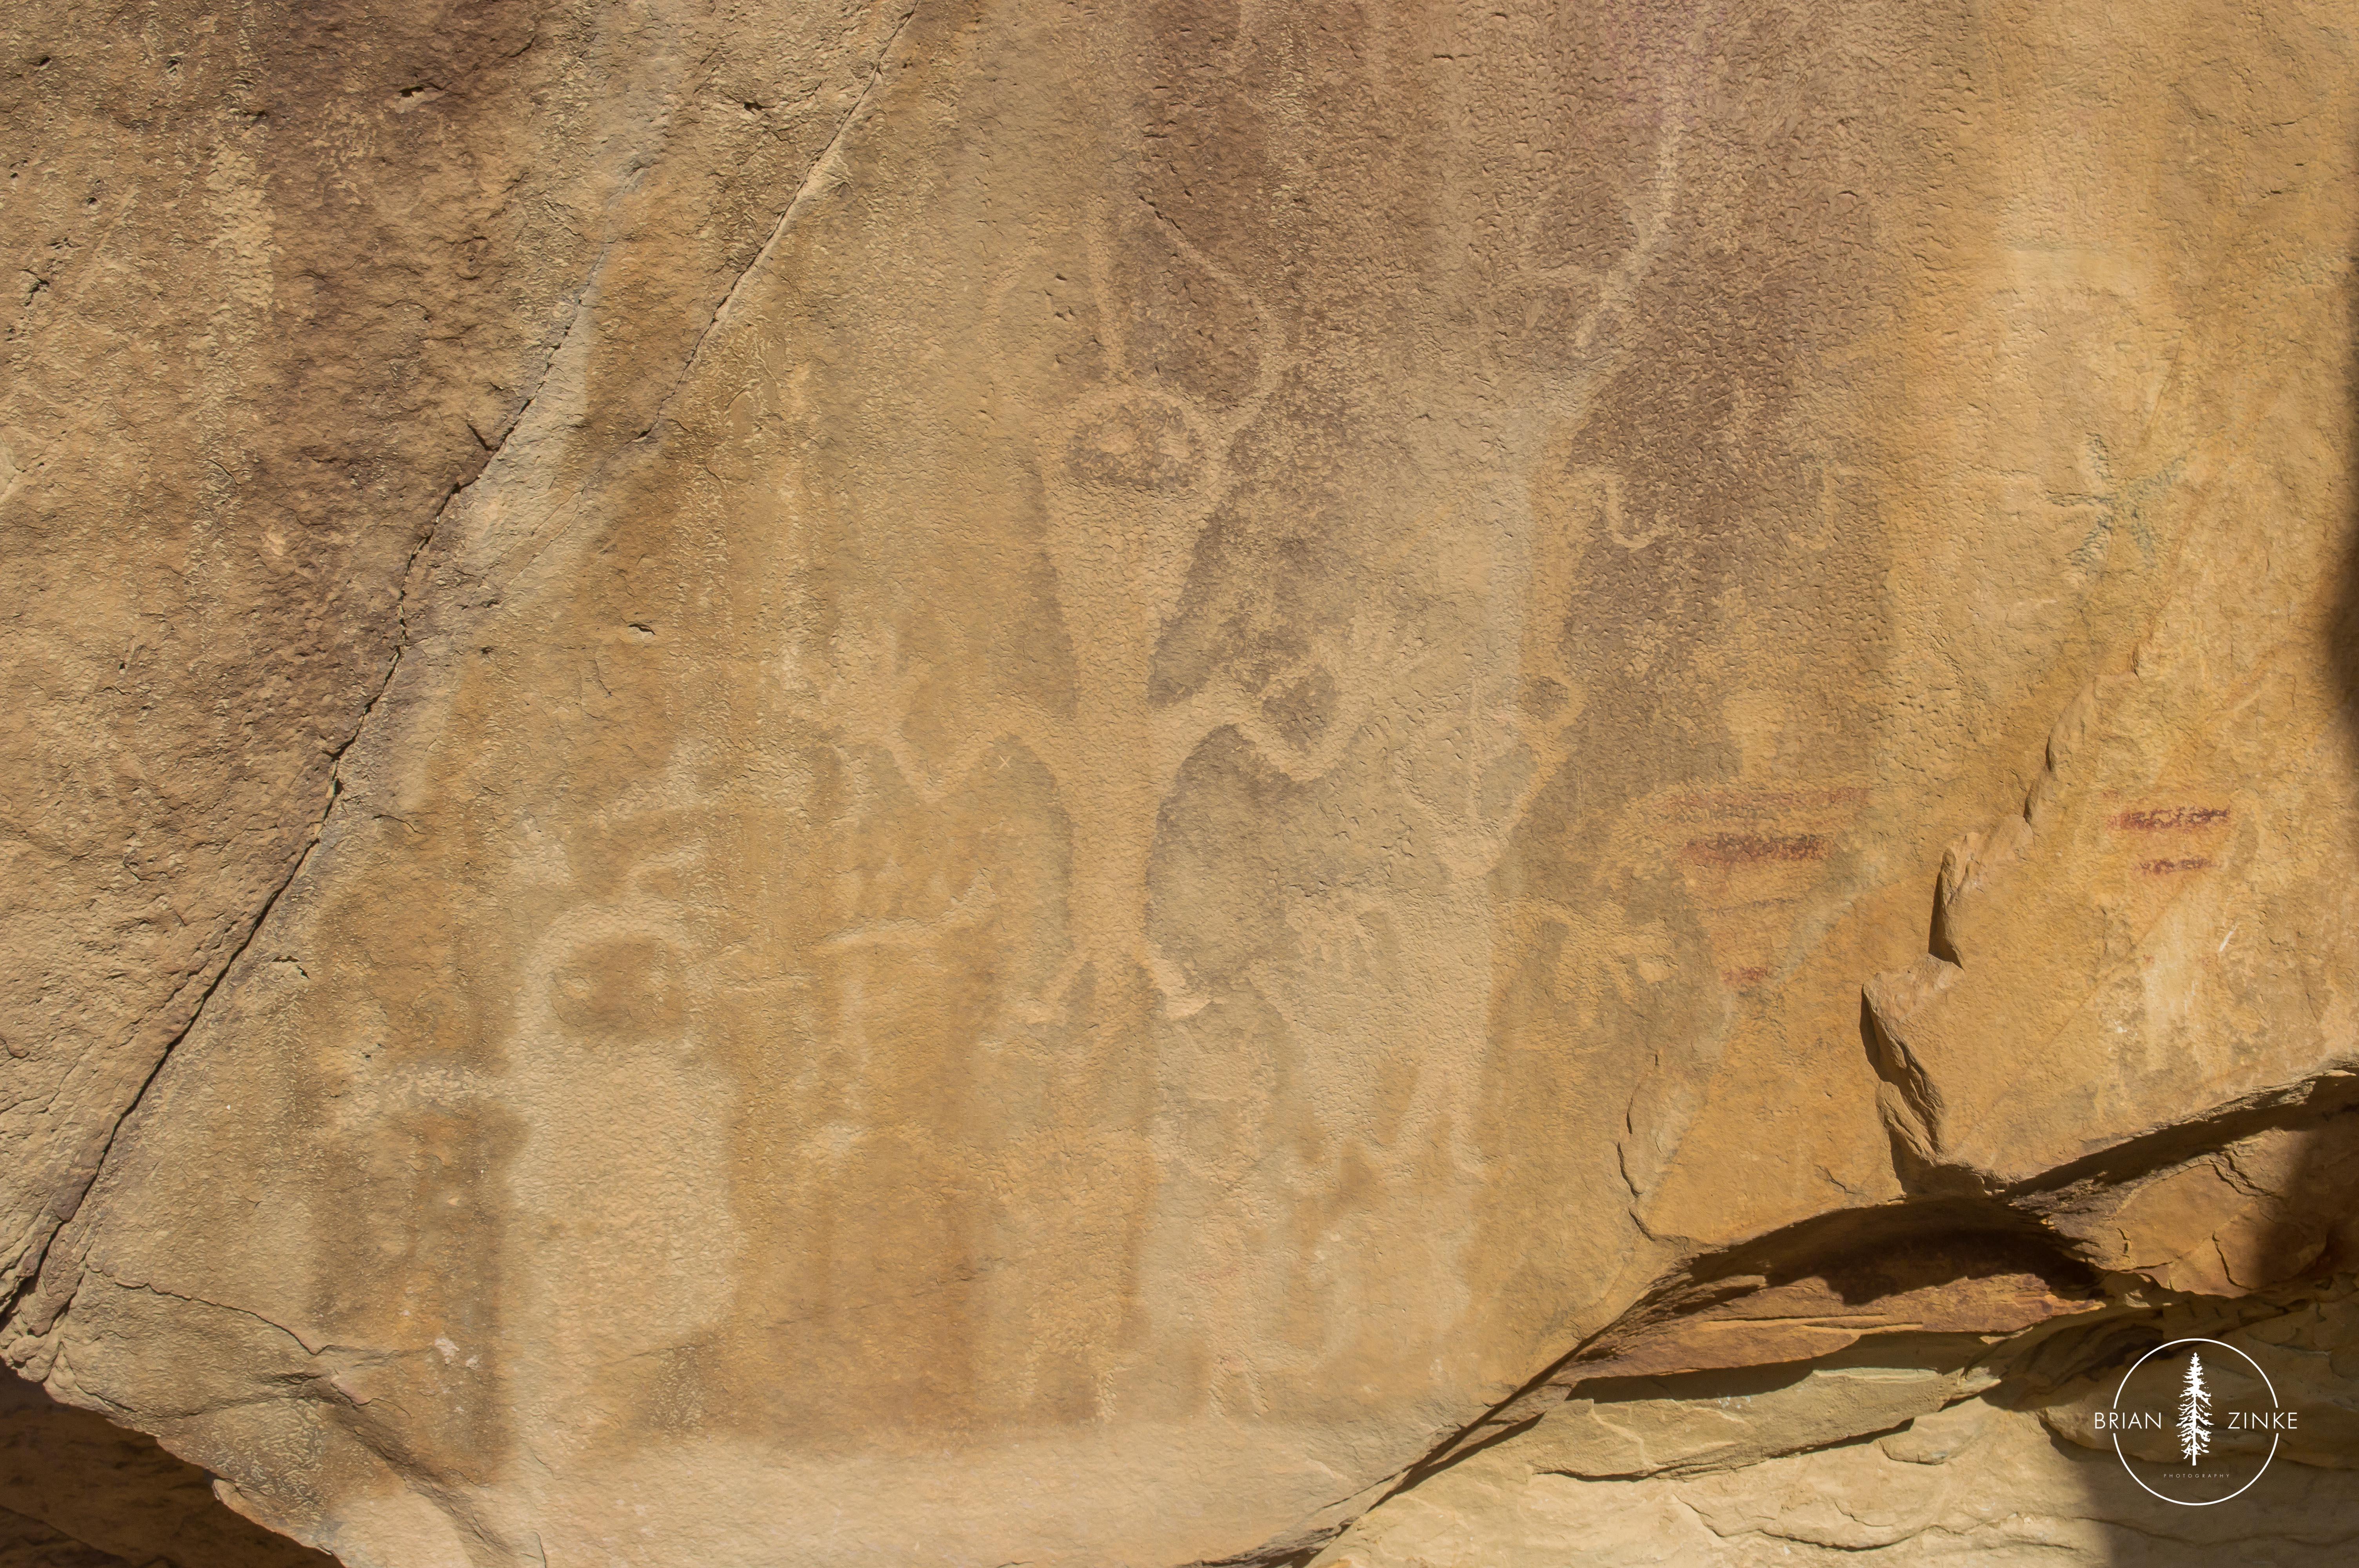 Swelter Shelter, petroglyphs, pictographs, Dinosaur National Monument, Vernal, Utah